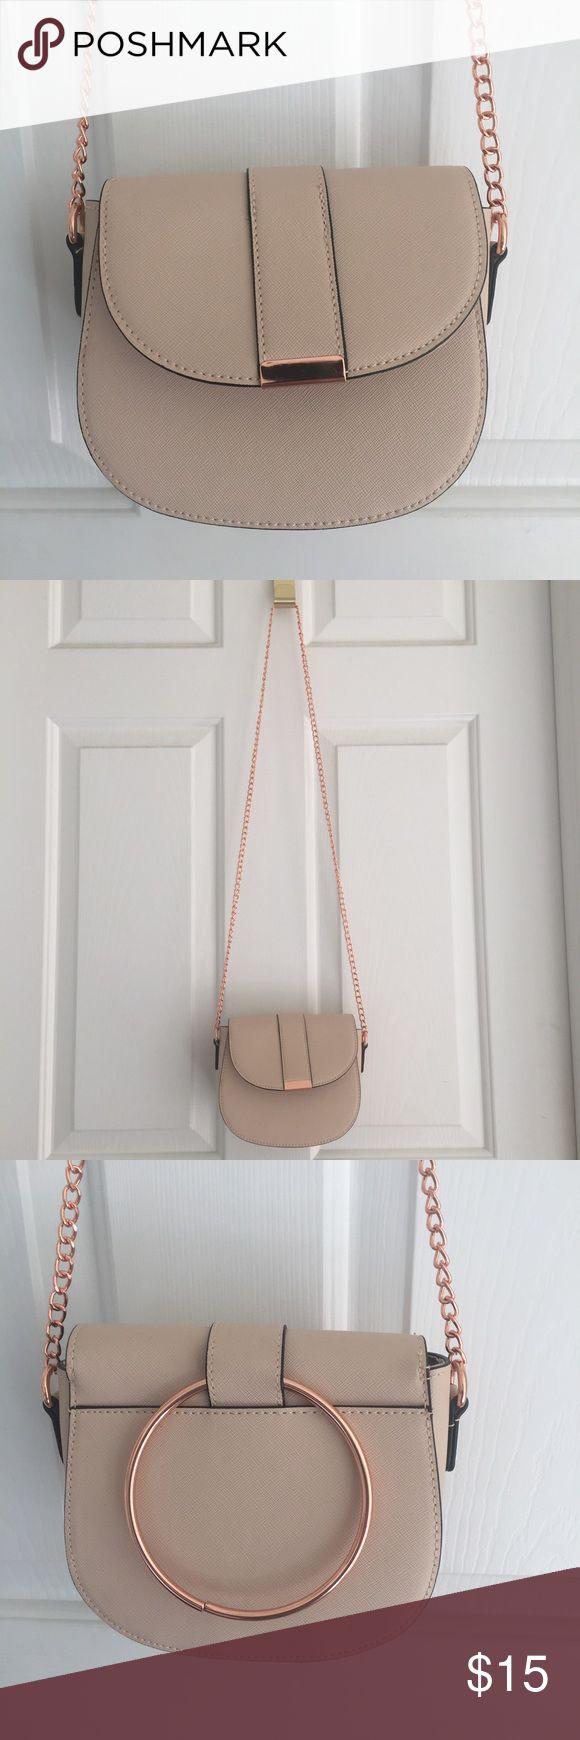 Pink Rose Gold Chain Crossbody Bag Cute bag only worn once! Zipper pocket inside Primark Bags Crossbody Bags